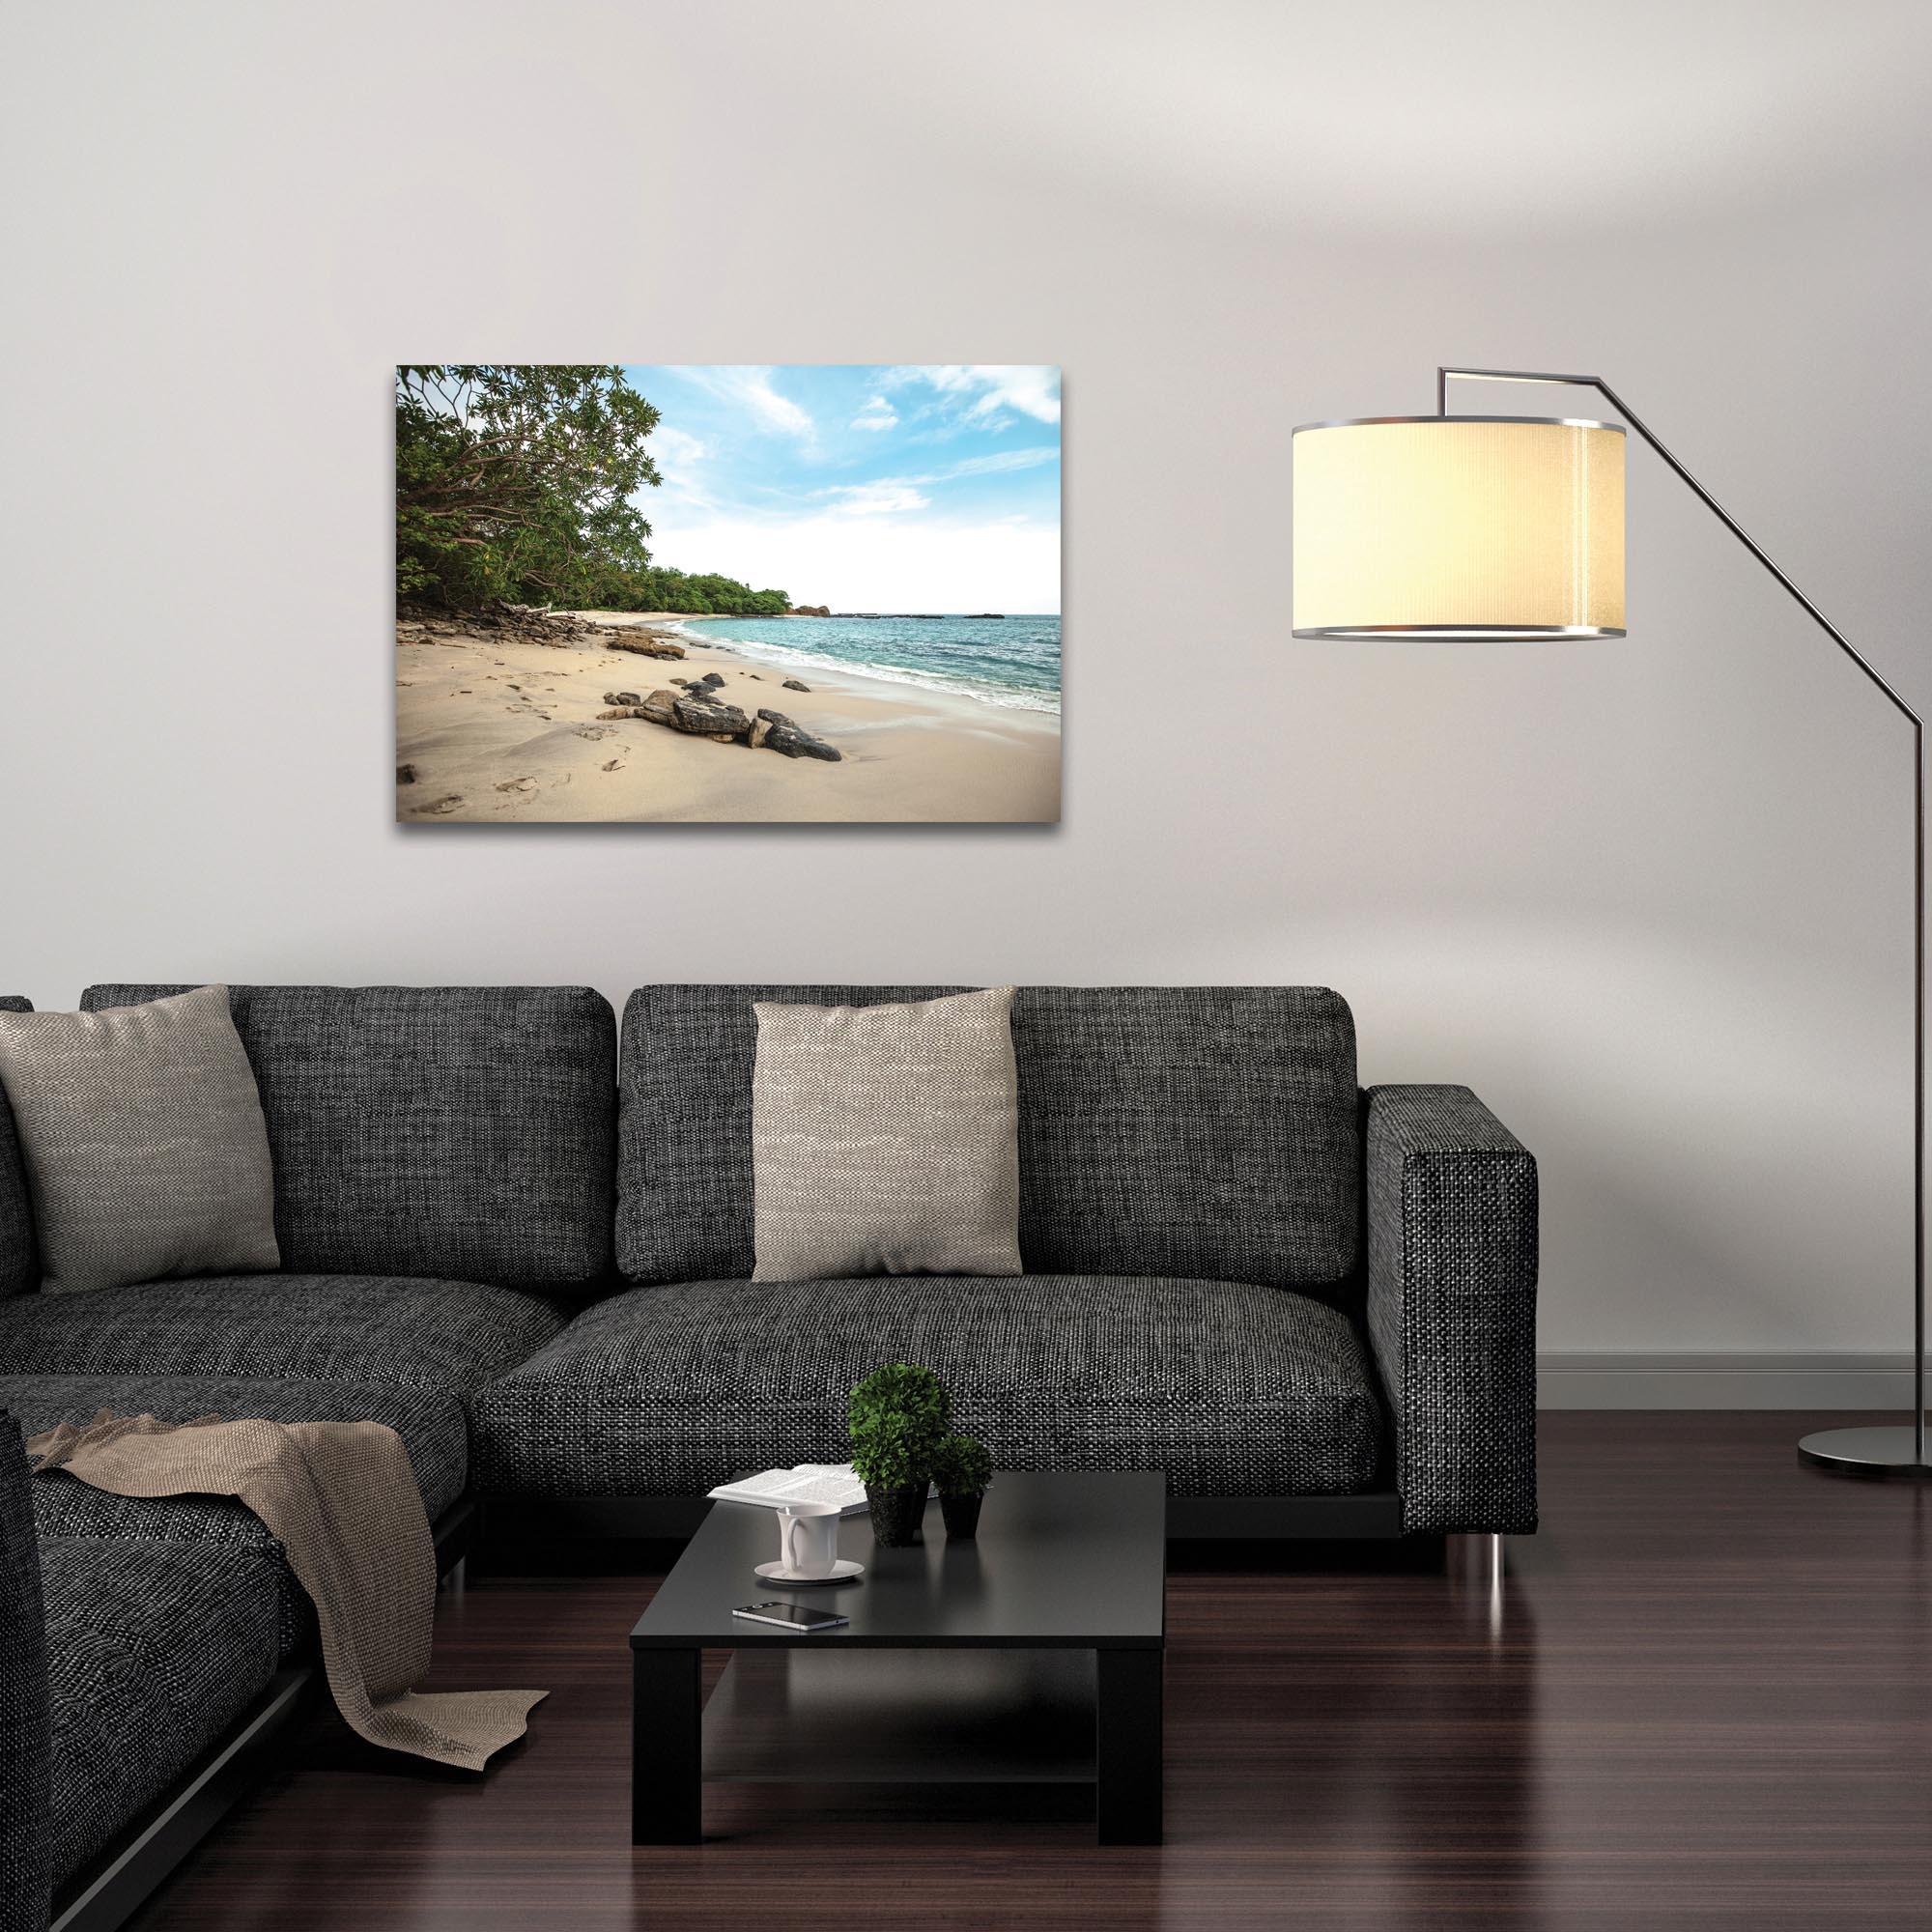 Coastal Wall Art 'Paradise Cove' - Beach Decor on Metal or Plexiglass - Lifestyle View